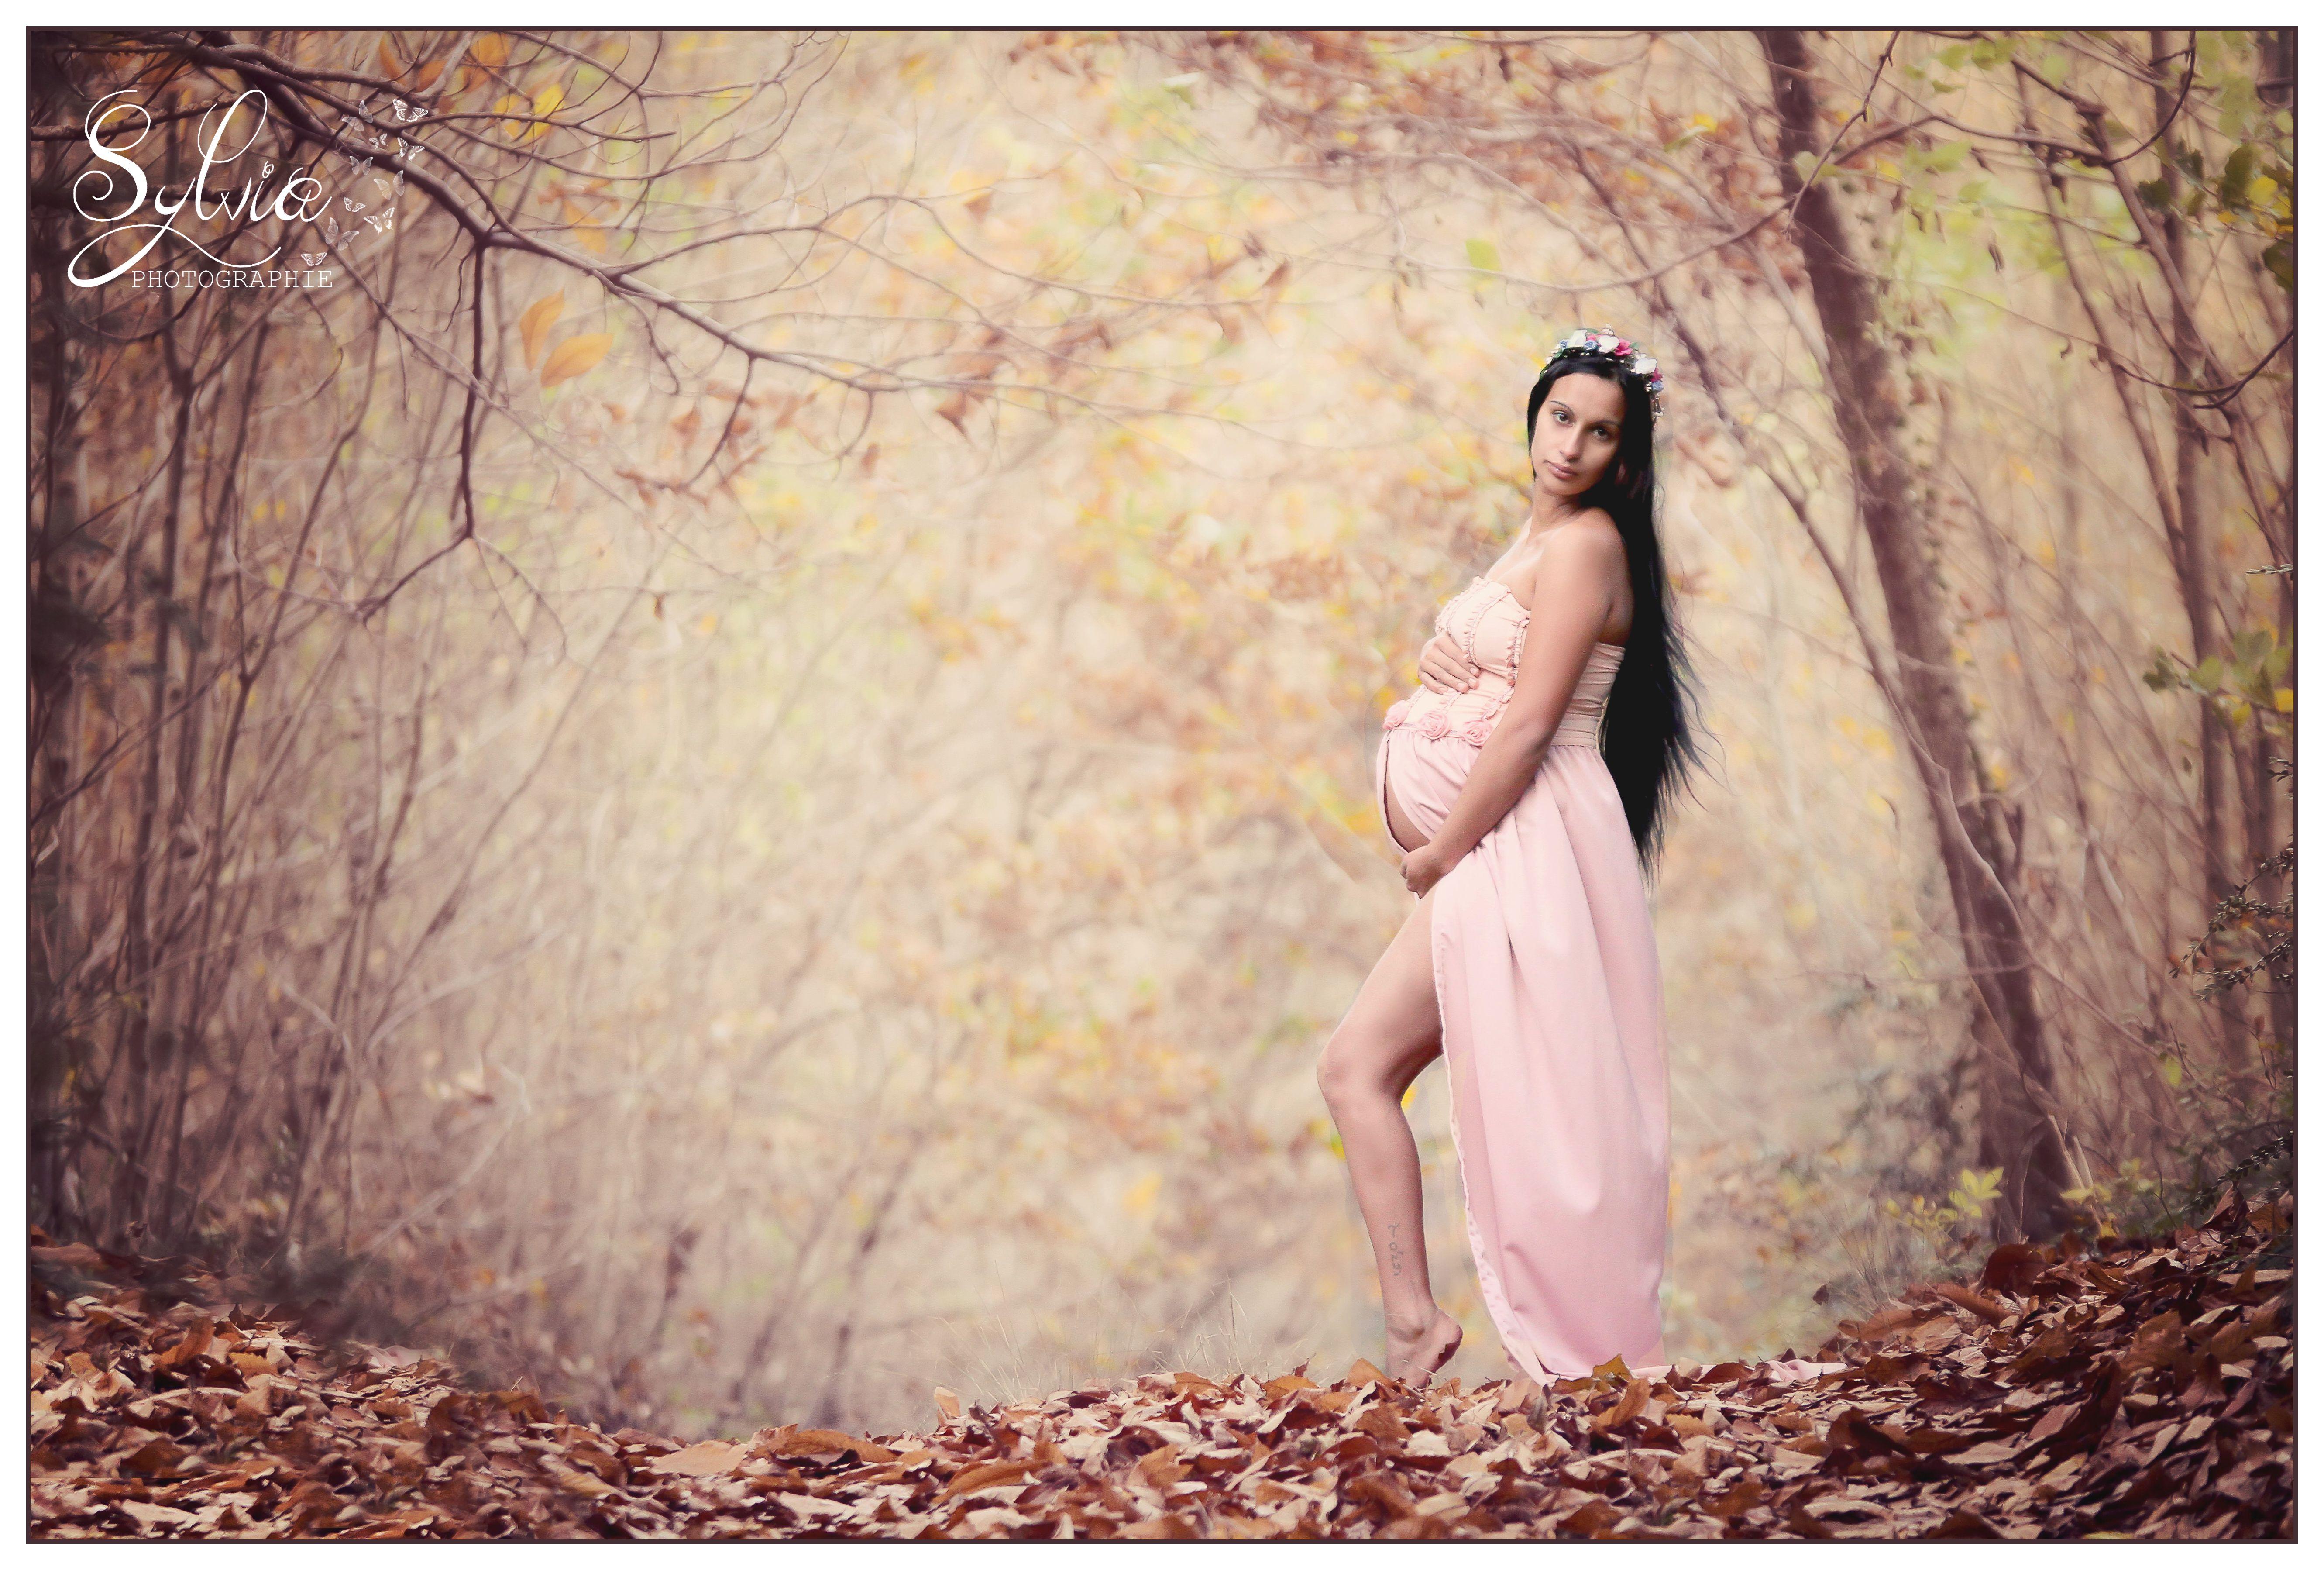 sylvia -sylvia photographie -5746si